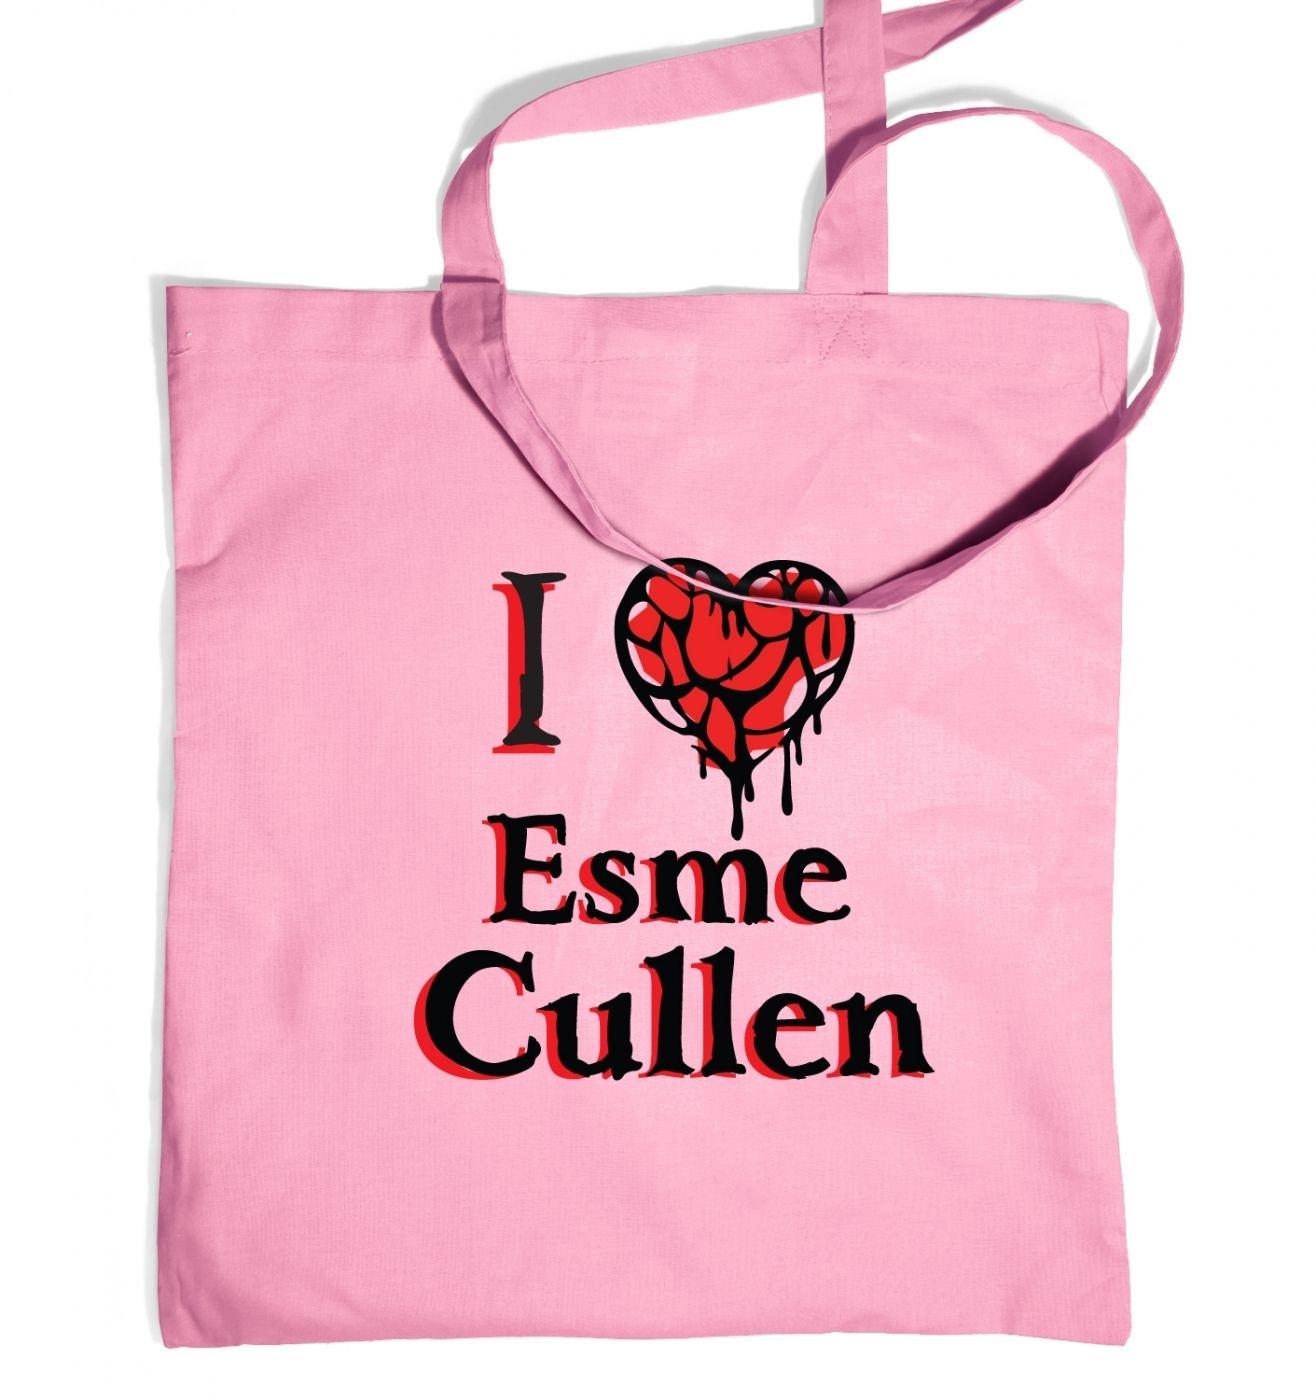 I Heart Esme Cullen tote bag